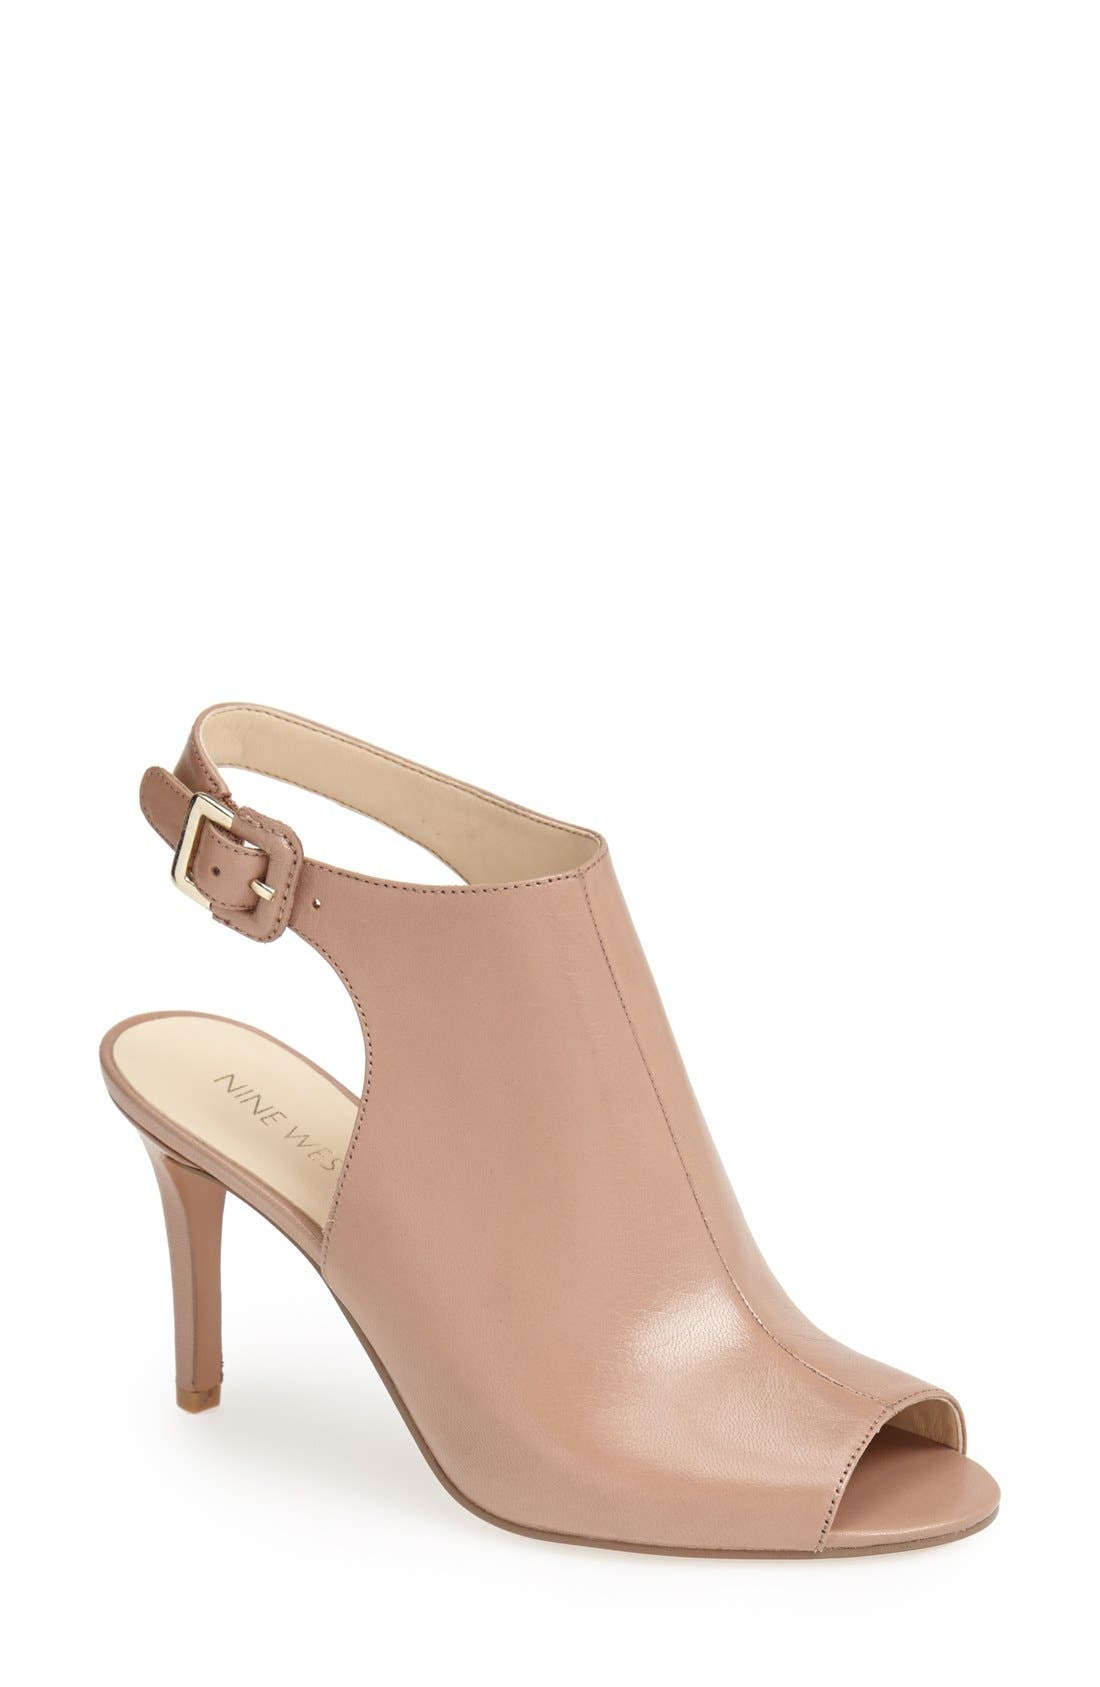 Main Image - Nine West 'Instafun' Leather Sandal (Women)